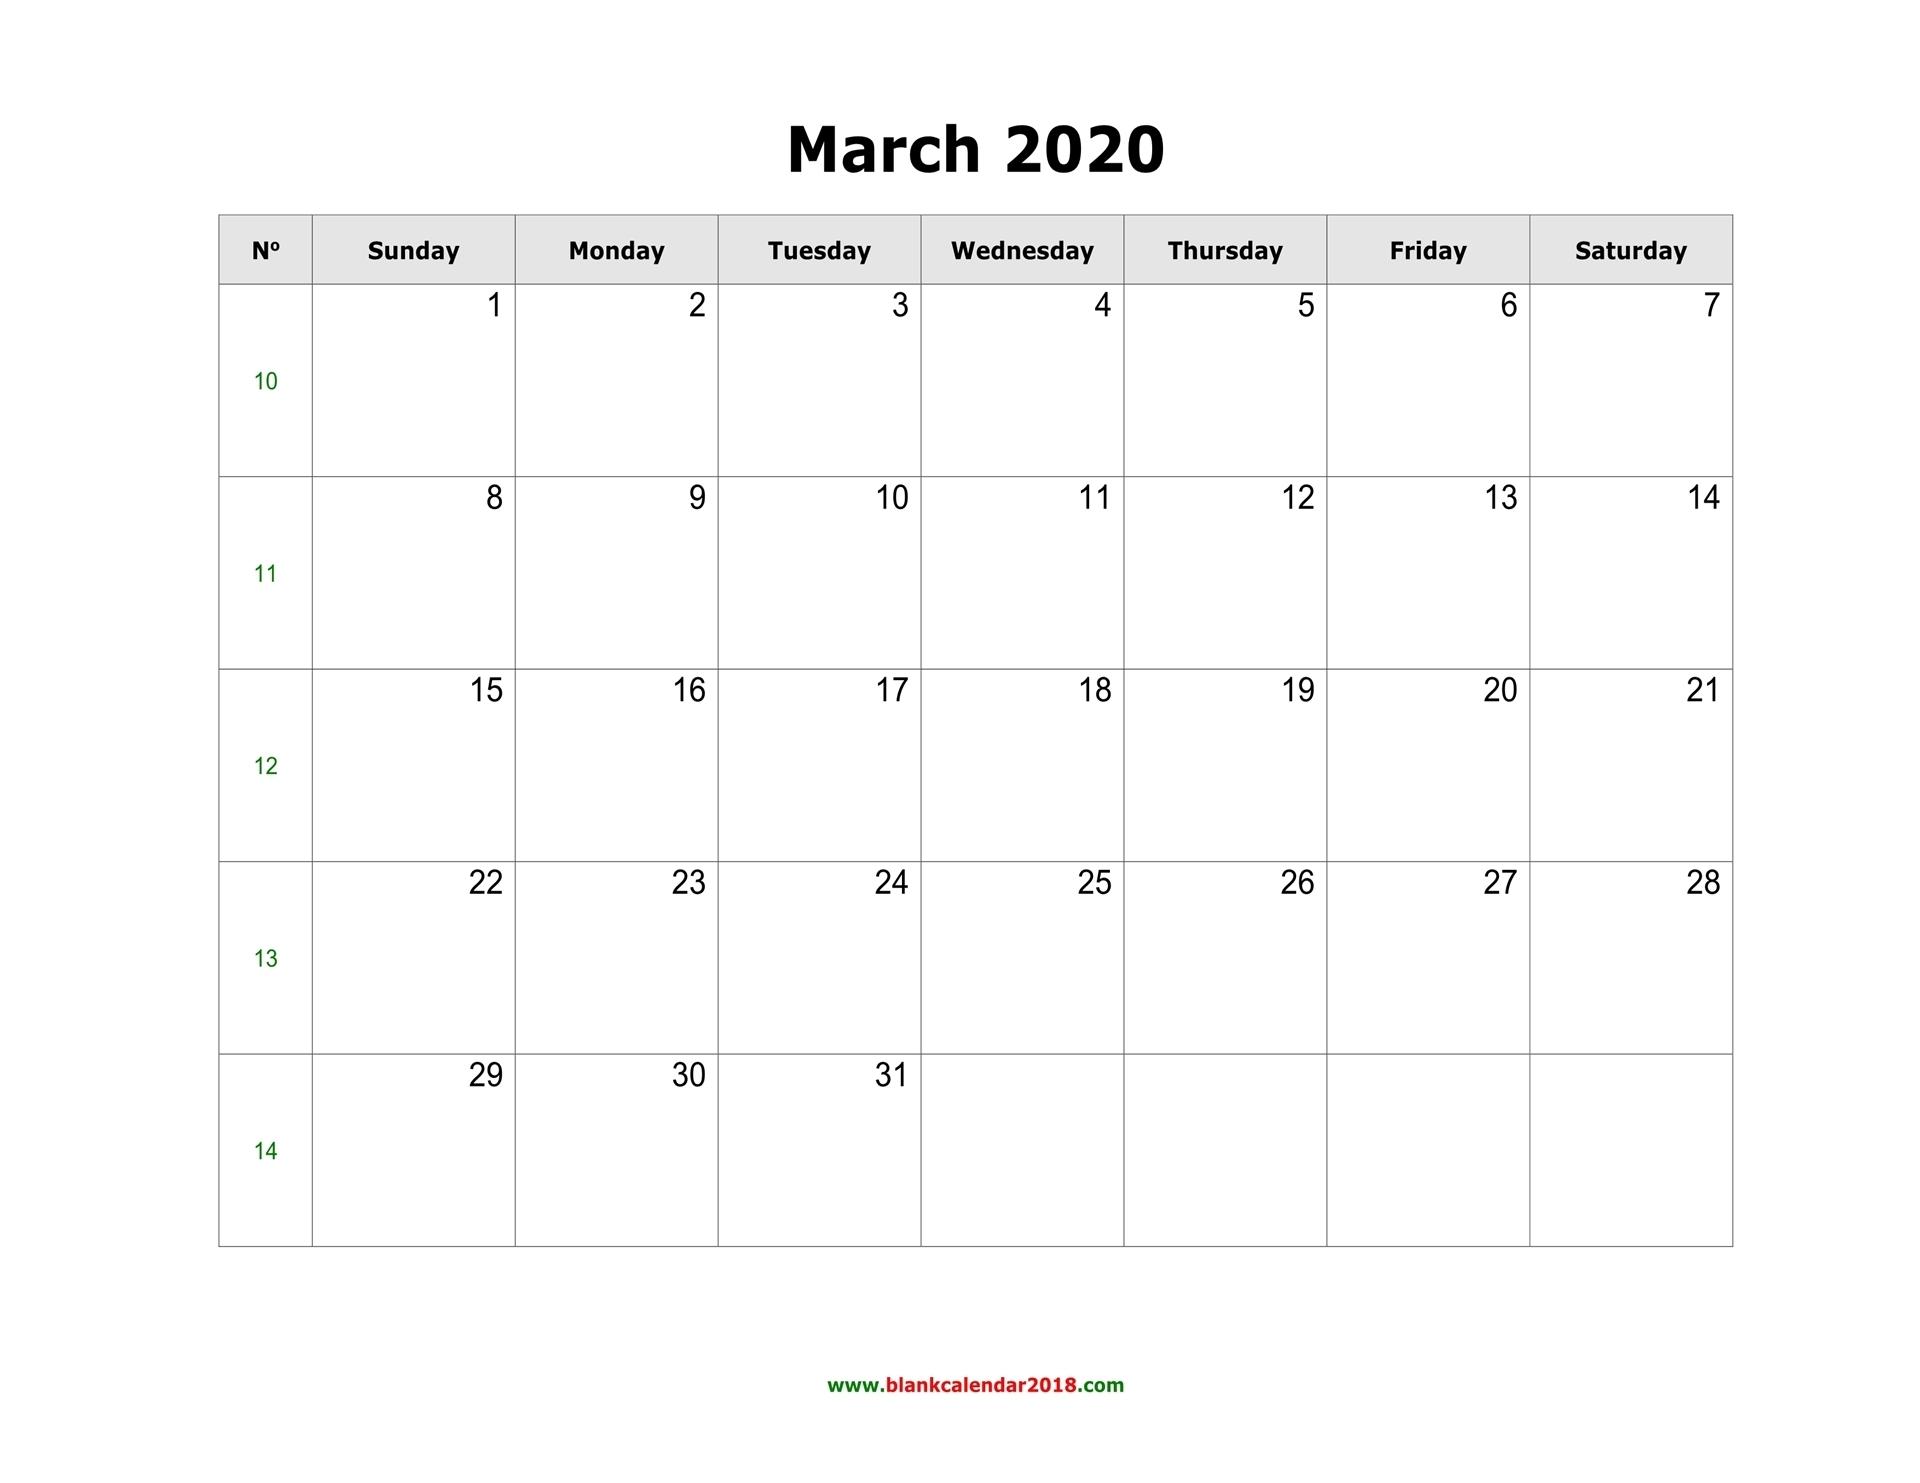 Blank Calendar For March 2020